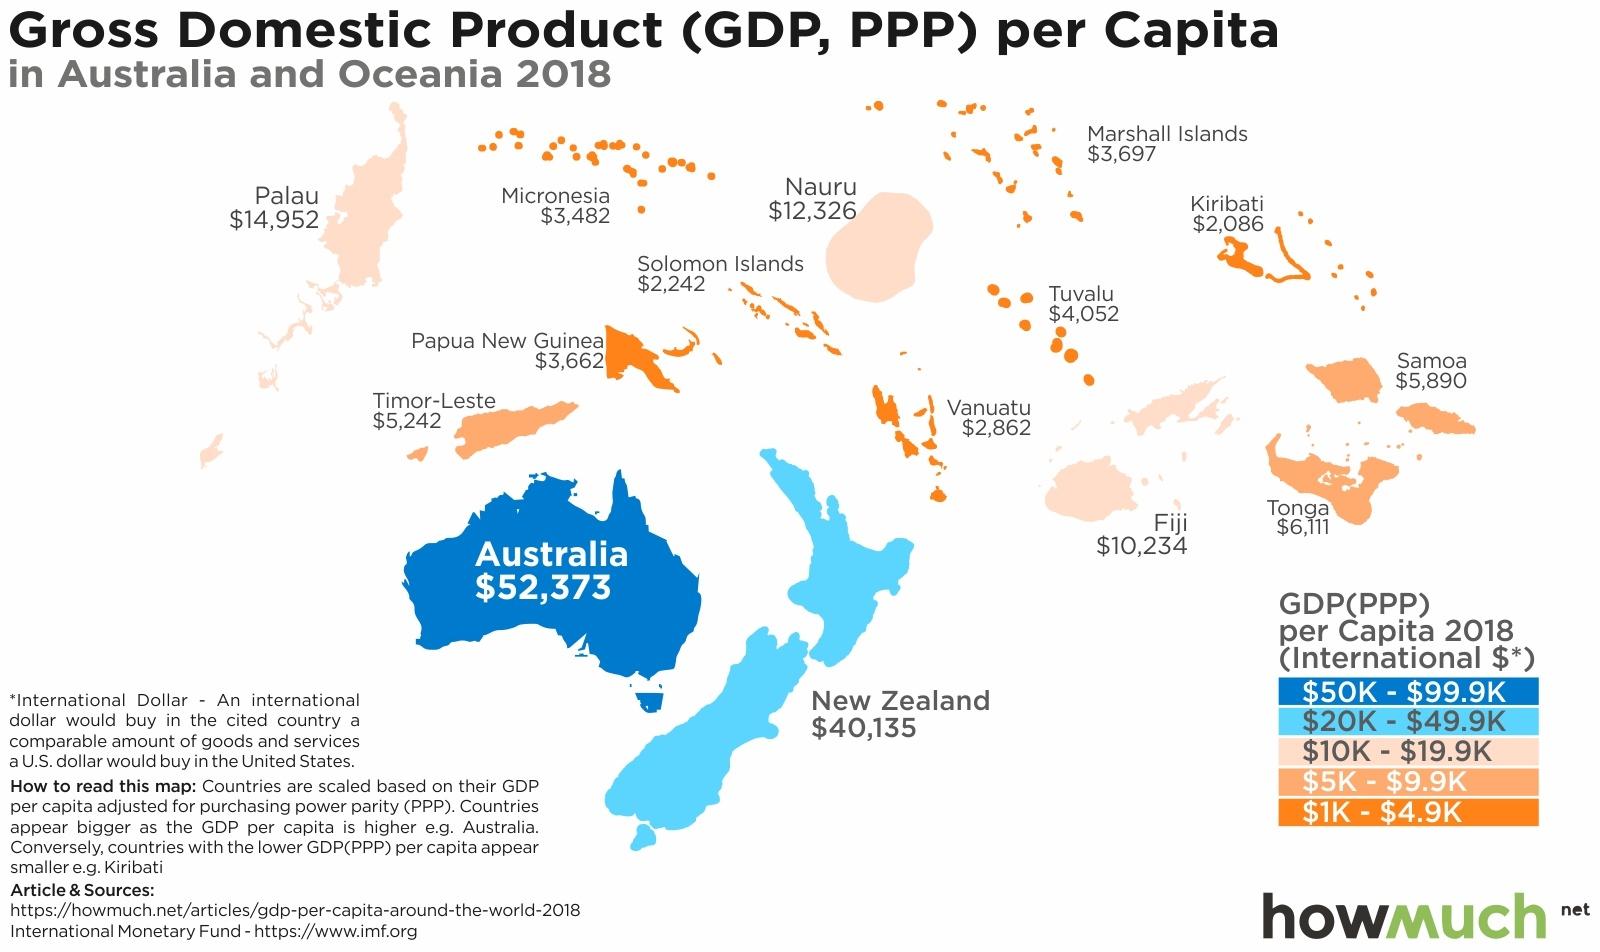 GDP (PPP) per Capita Oceania